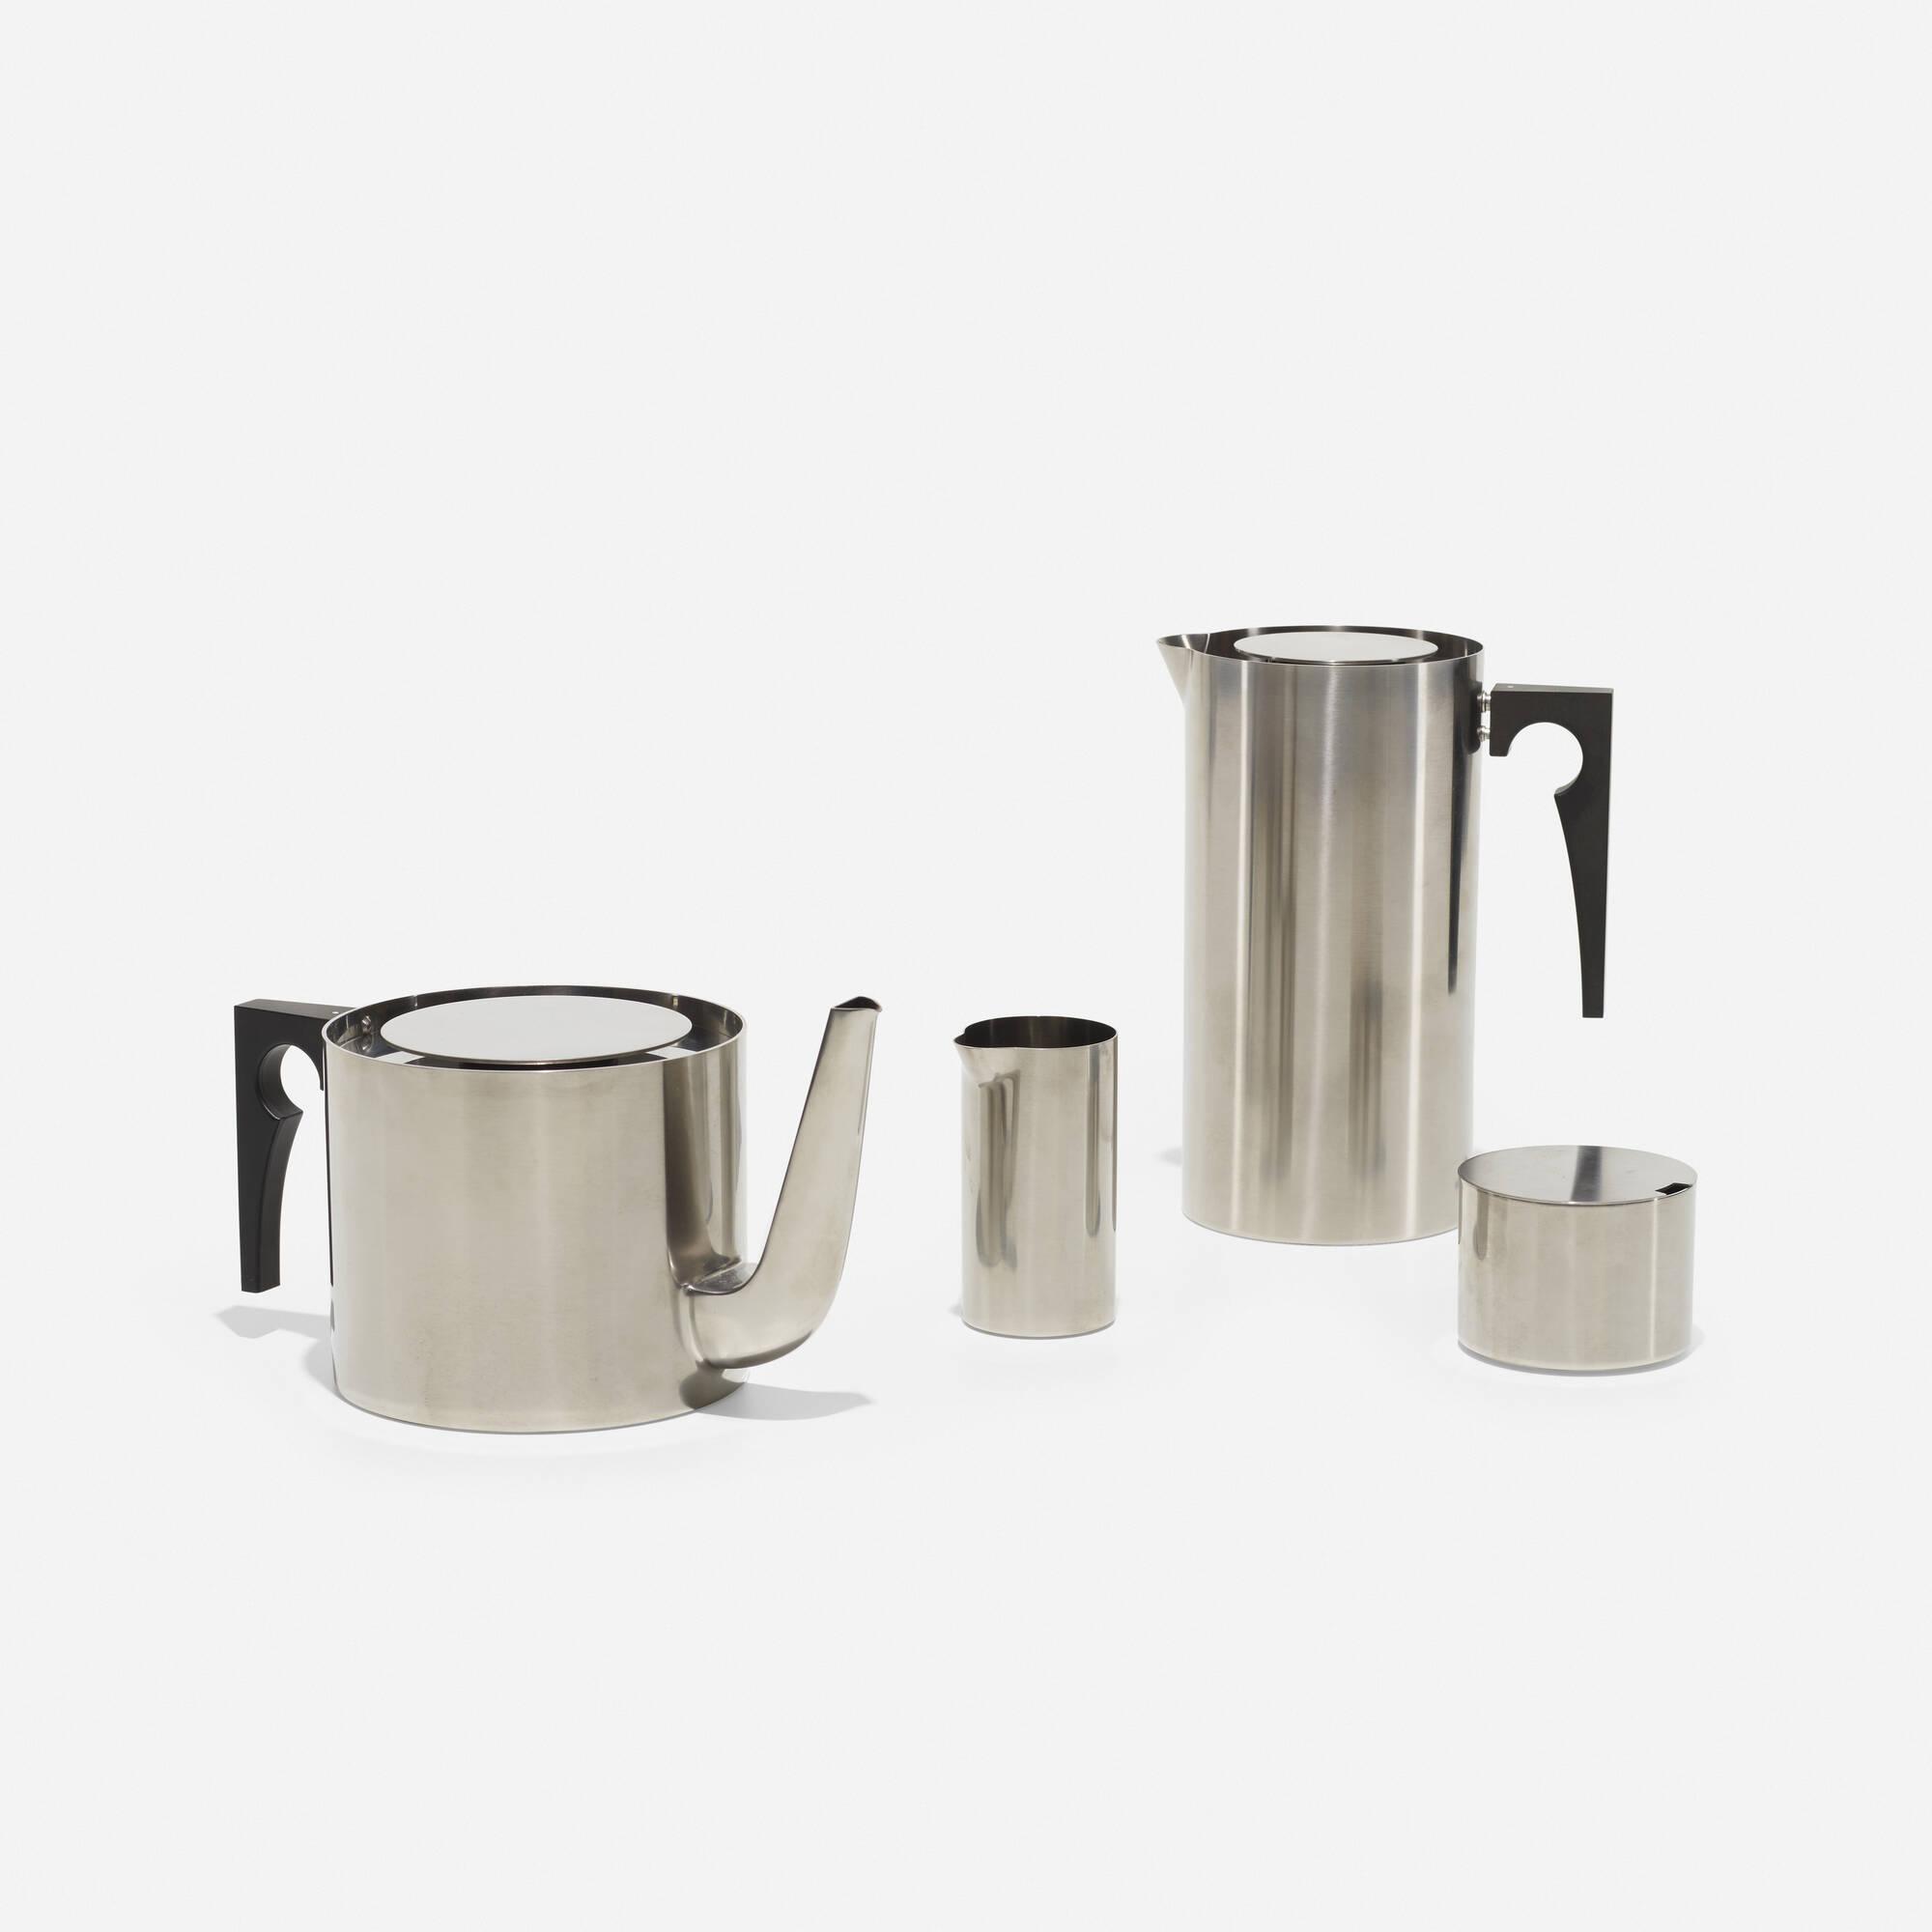 387: Arne Jacobsen / Cylinda tea and coffee service (2 of 2)